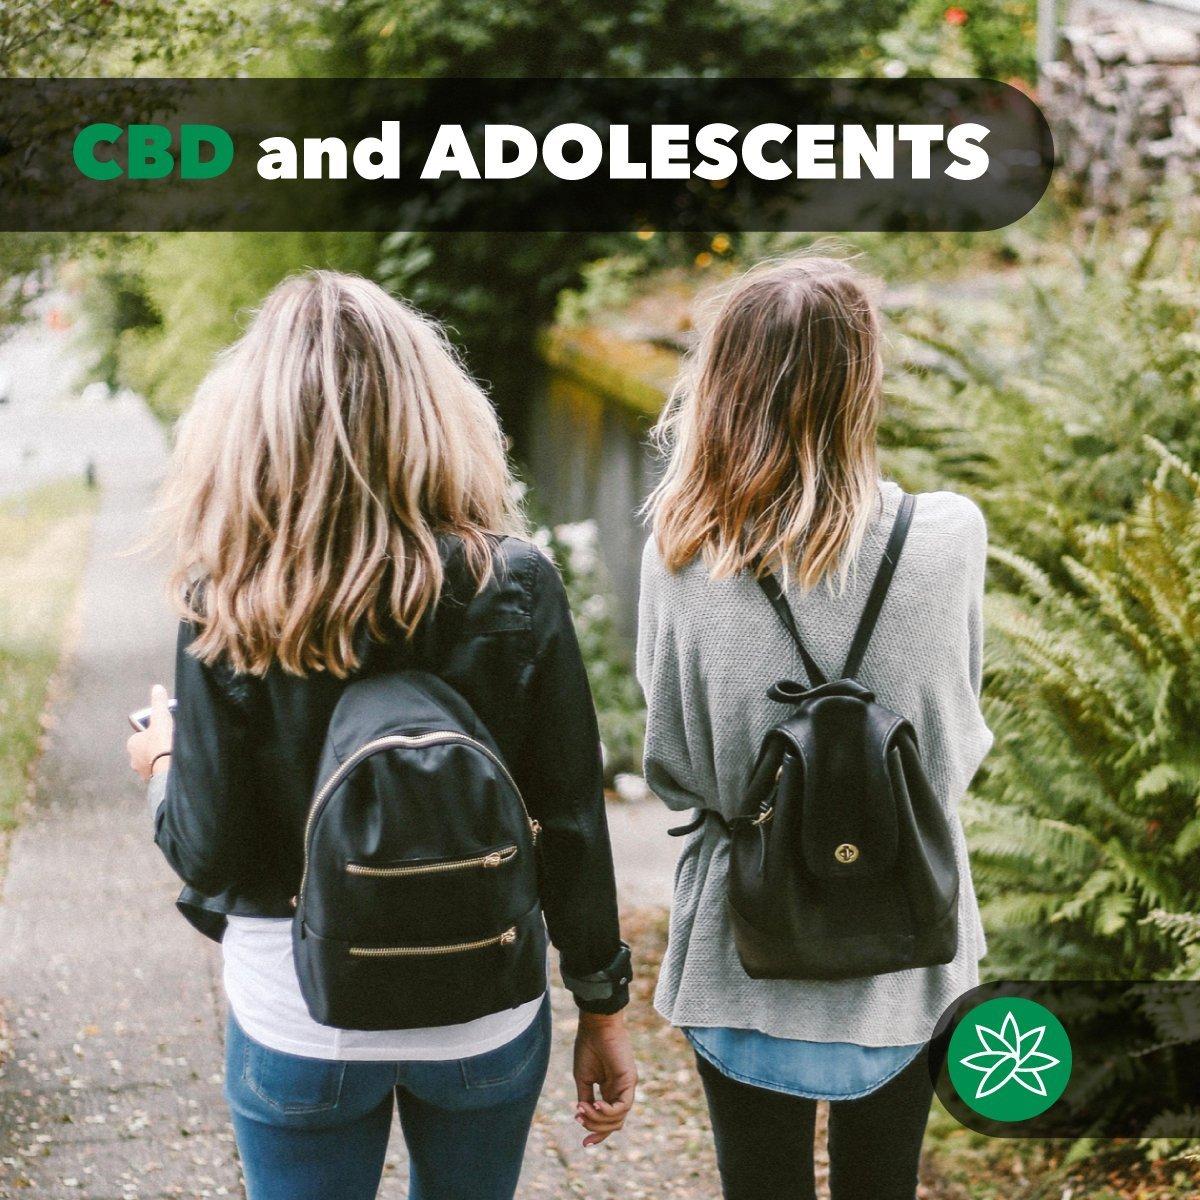 CBD and adolescents